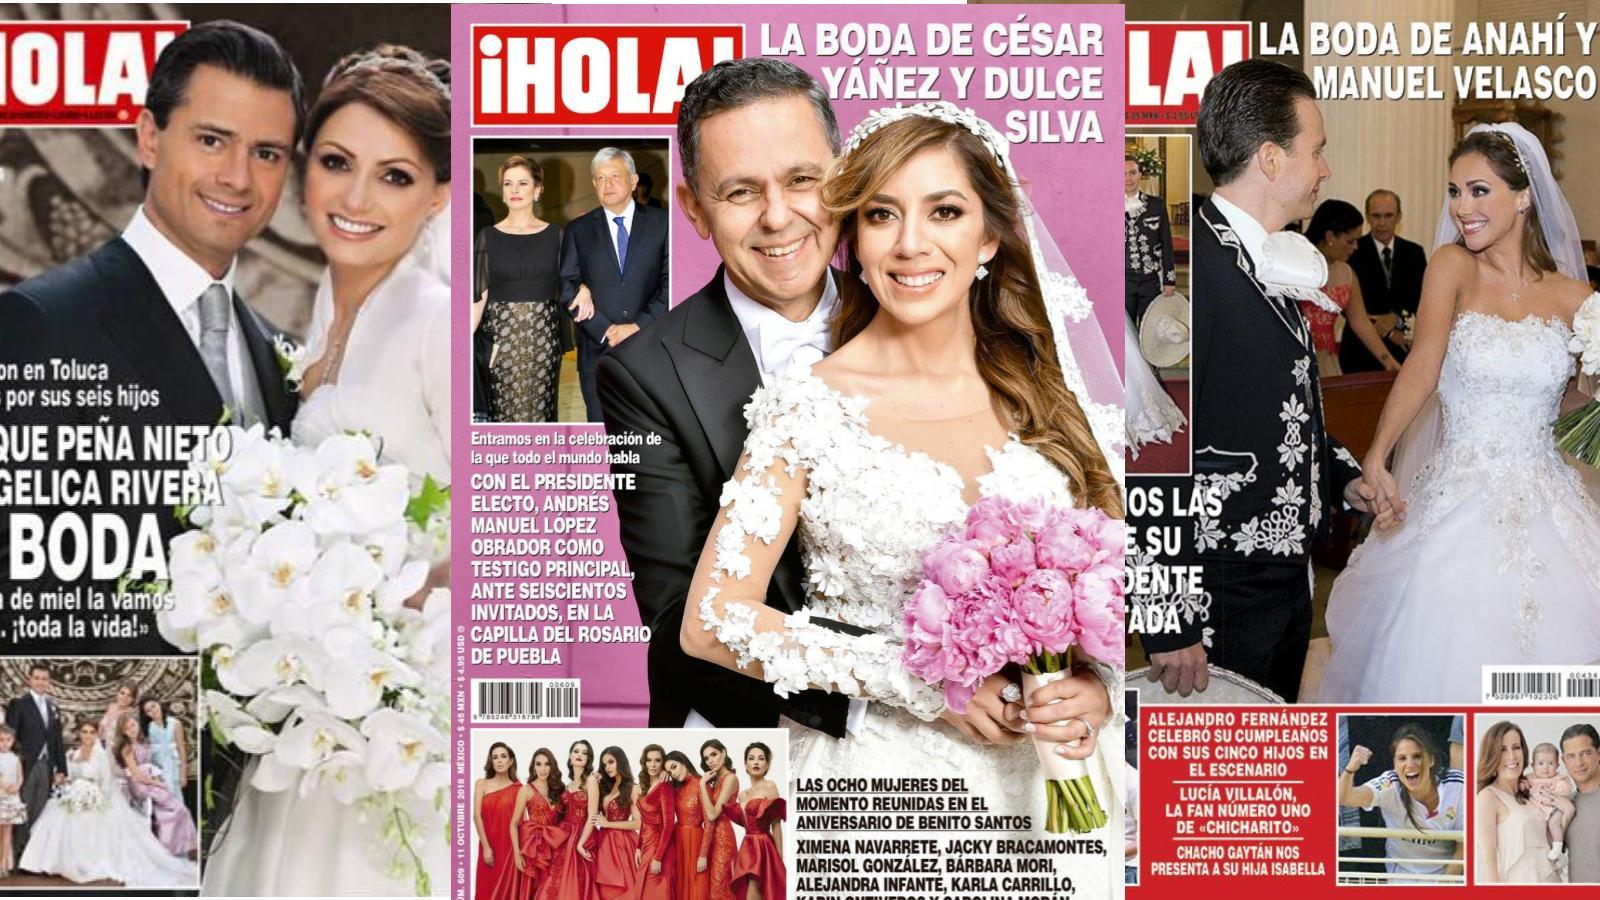 Indigna boda de César Yáñez en revista Hola